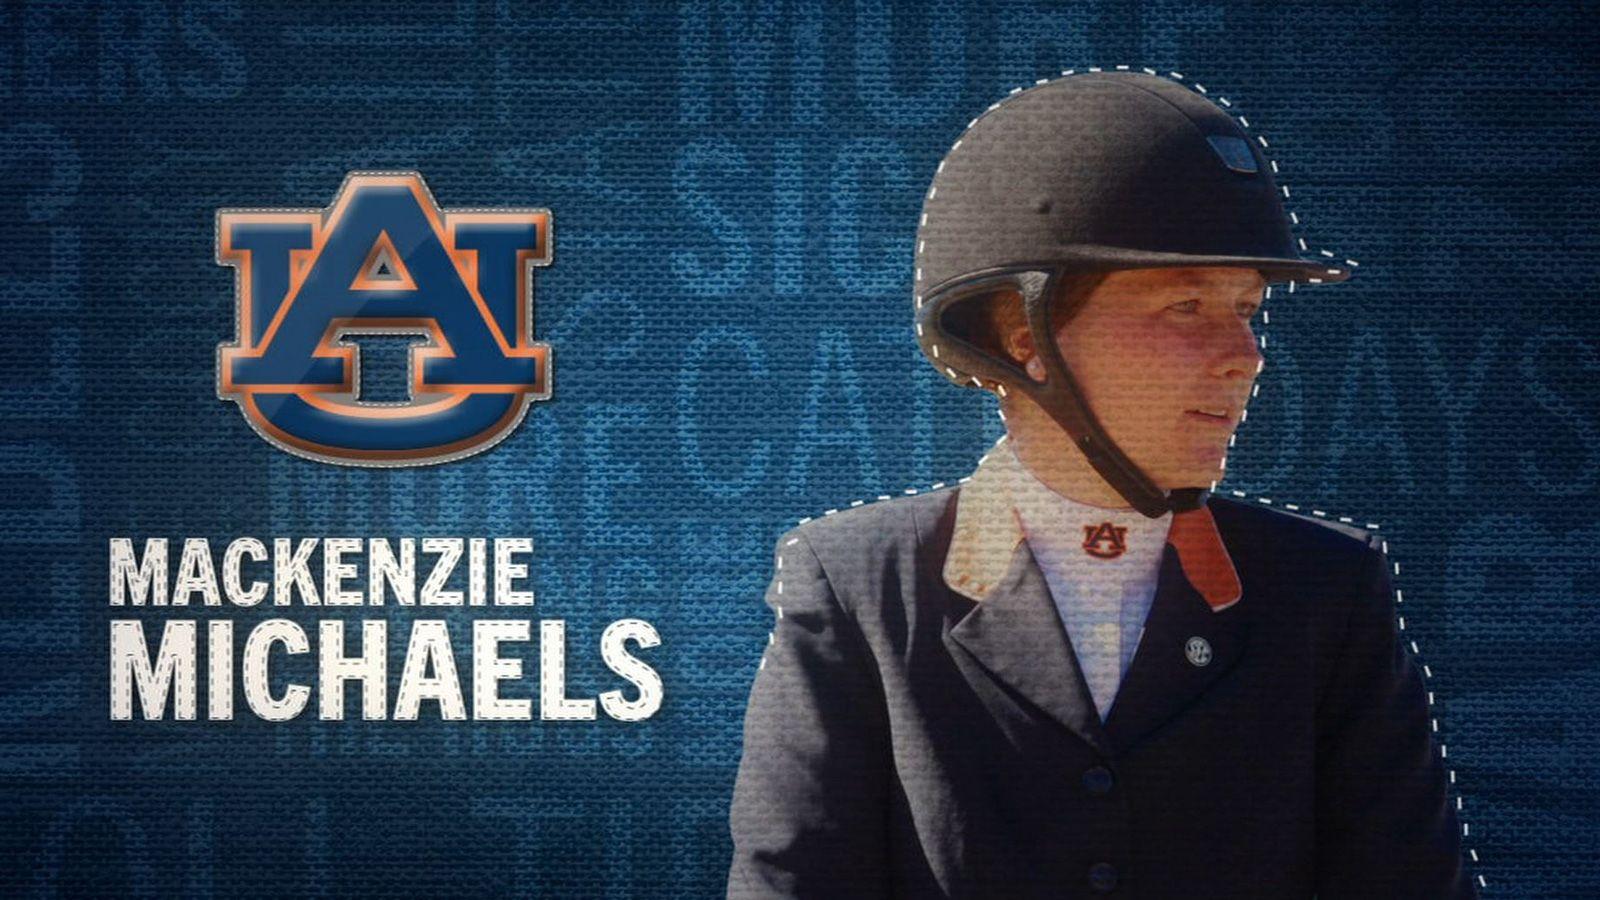 I am the SEC: Auburn's Mackenzie Michaels